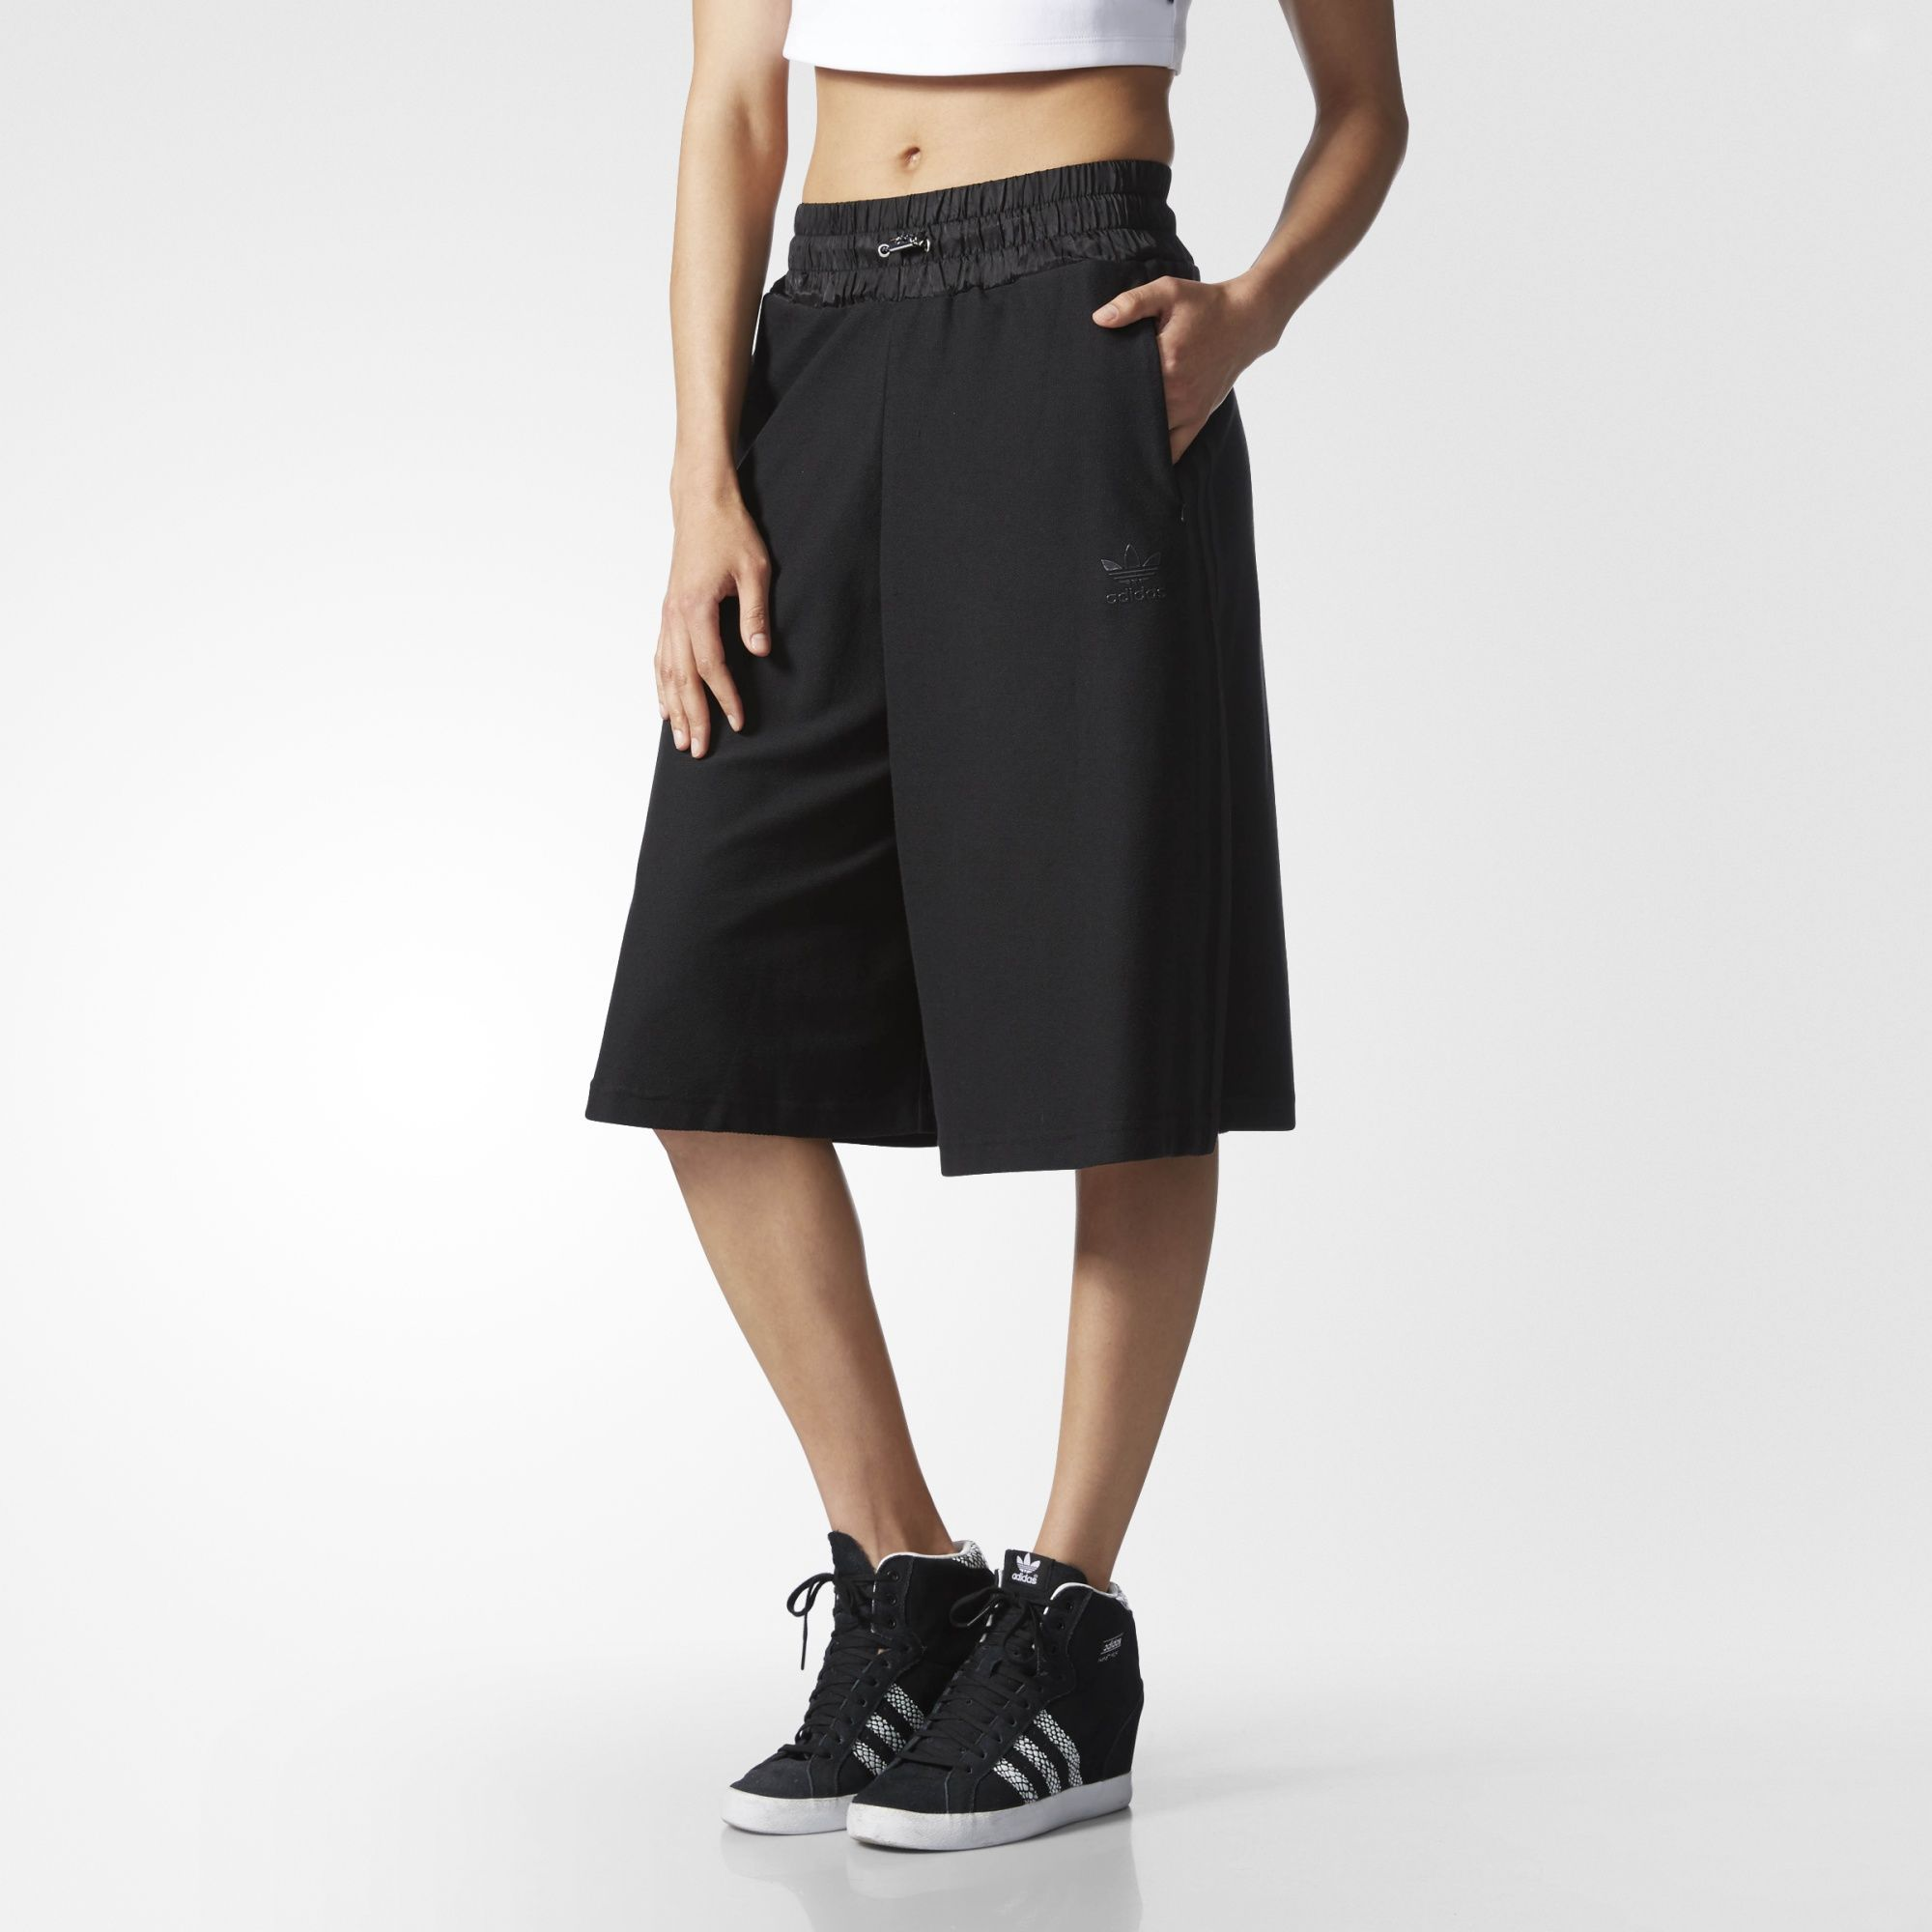 eeb64b69753eb9 adidas - Culotte Pants | desired. | Culotte pants, Leggings are not ...